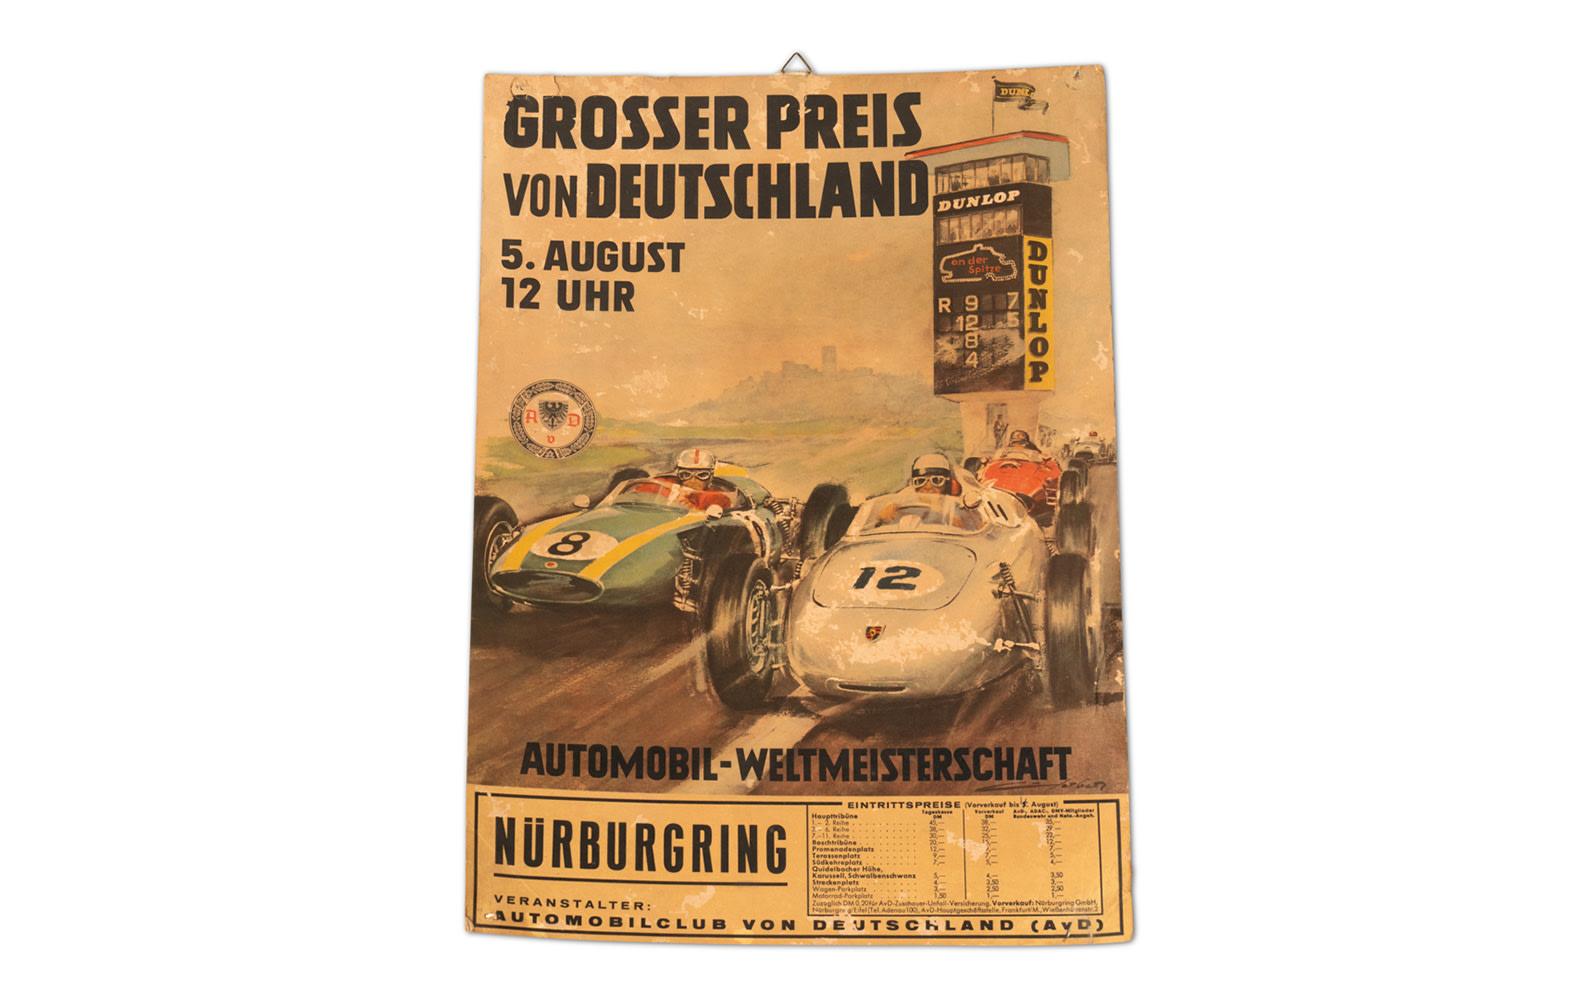 1962 German Grand Prix Official Poster